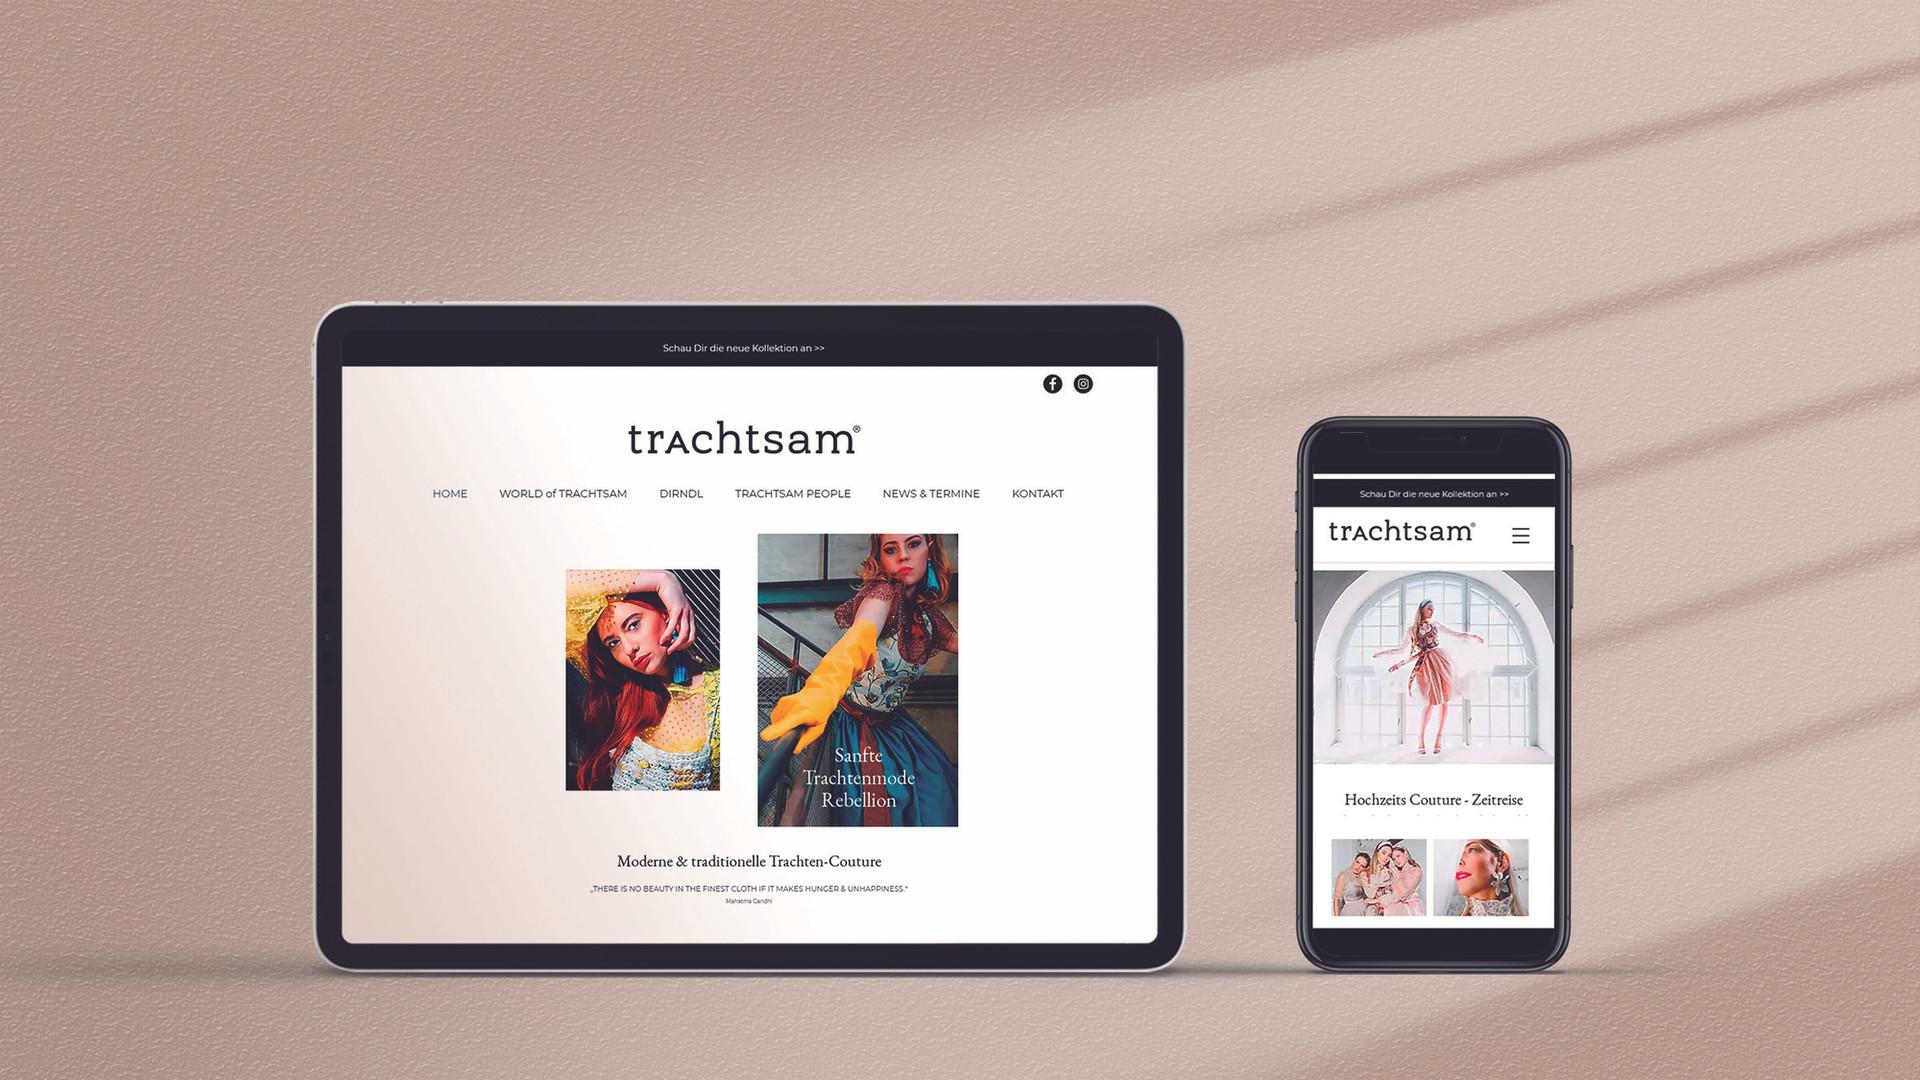 trachtsam_Webseite 2020